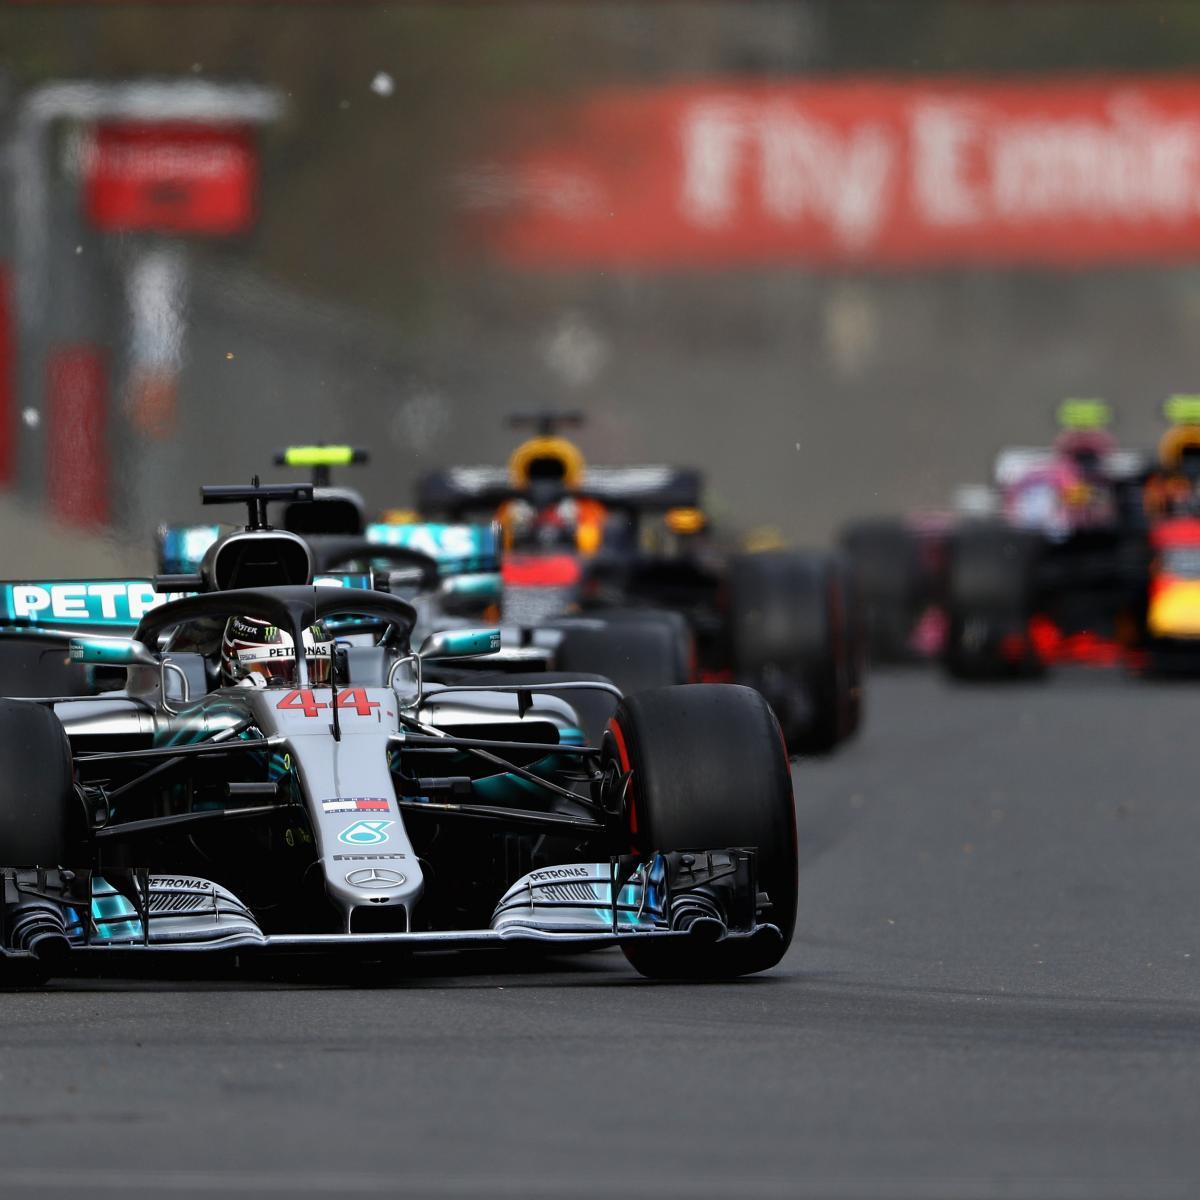 Azerbaijan News And Scores: Azerbaijan F1 Grand Prix 2018 Results: Lewis Hamilton Wins